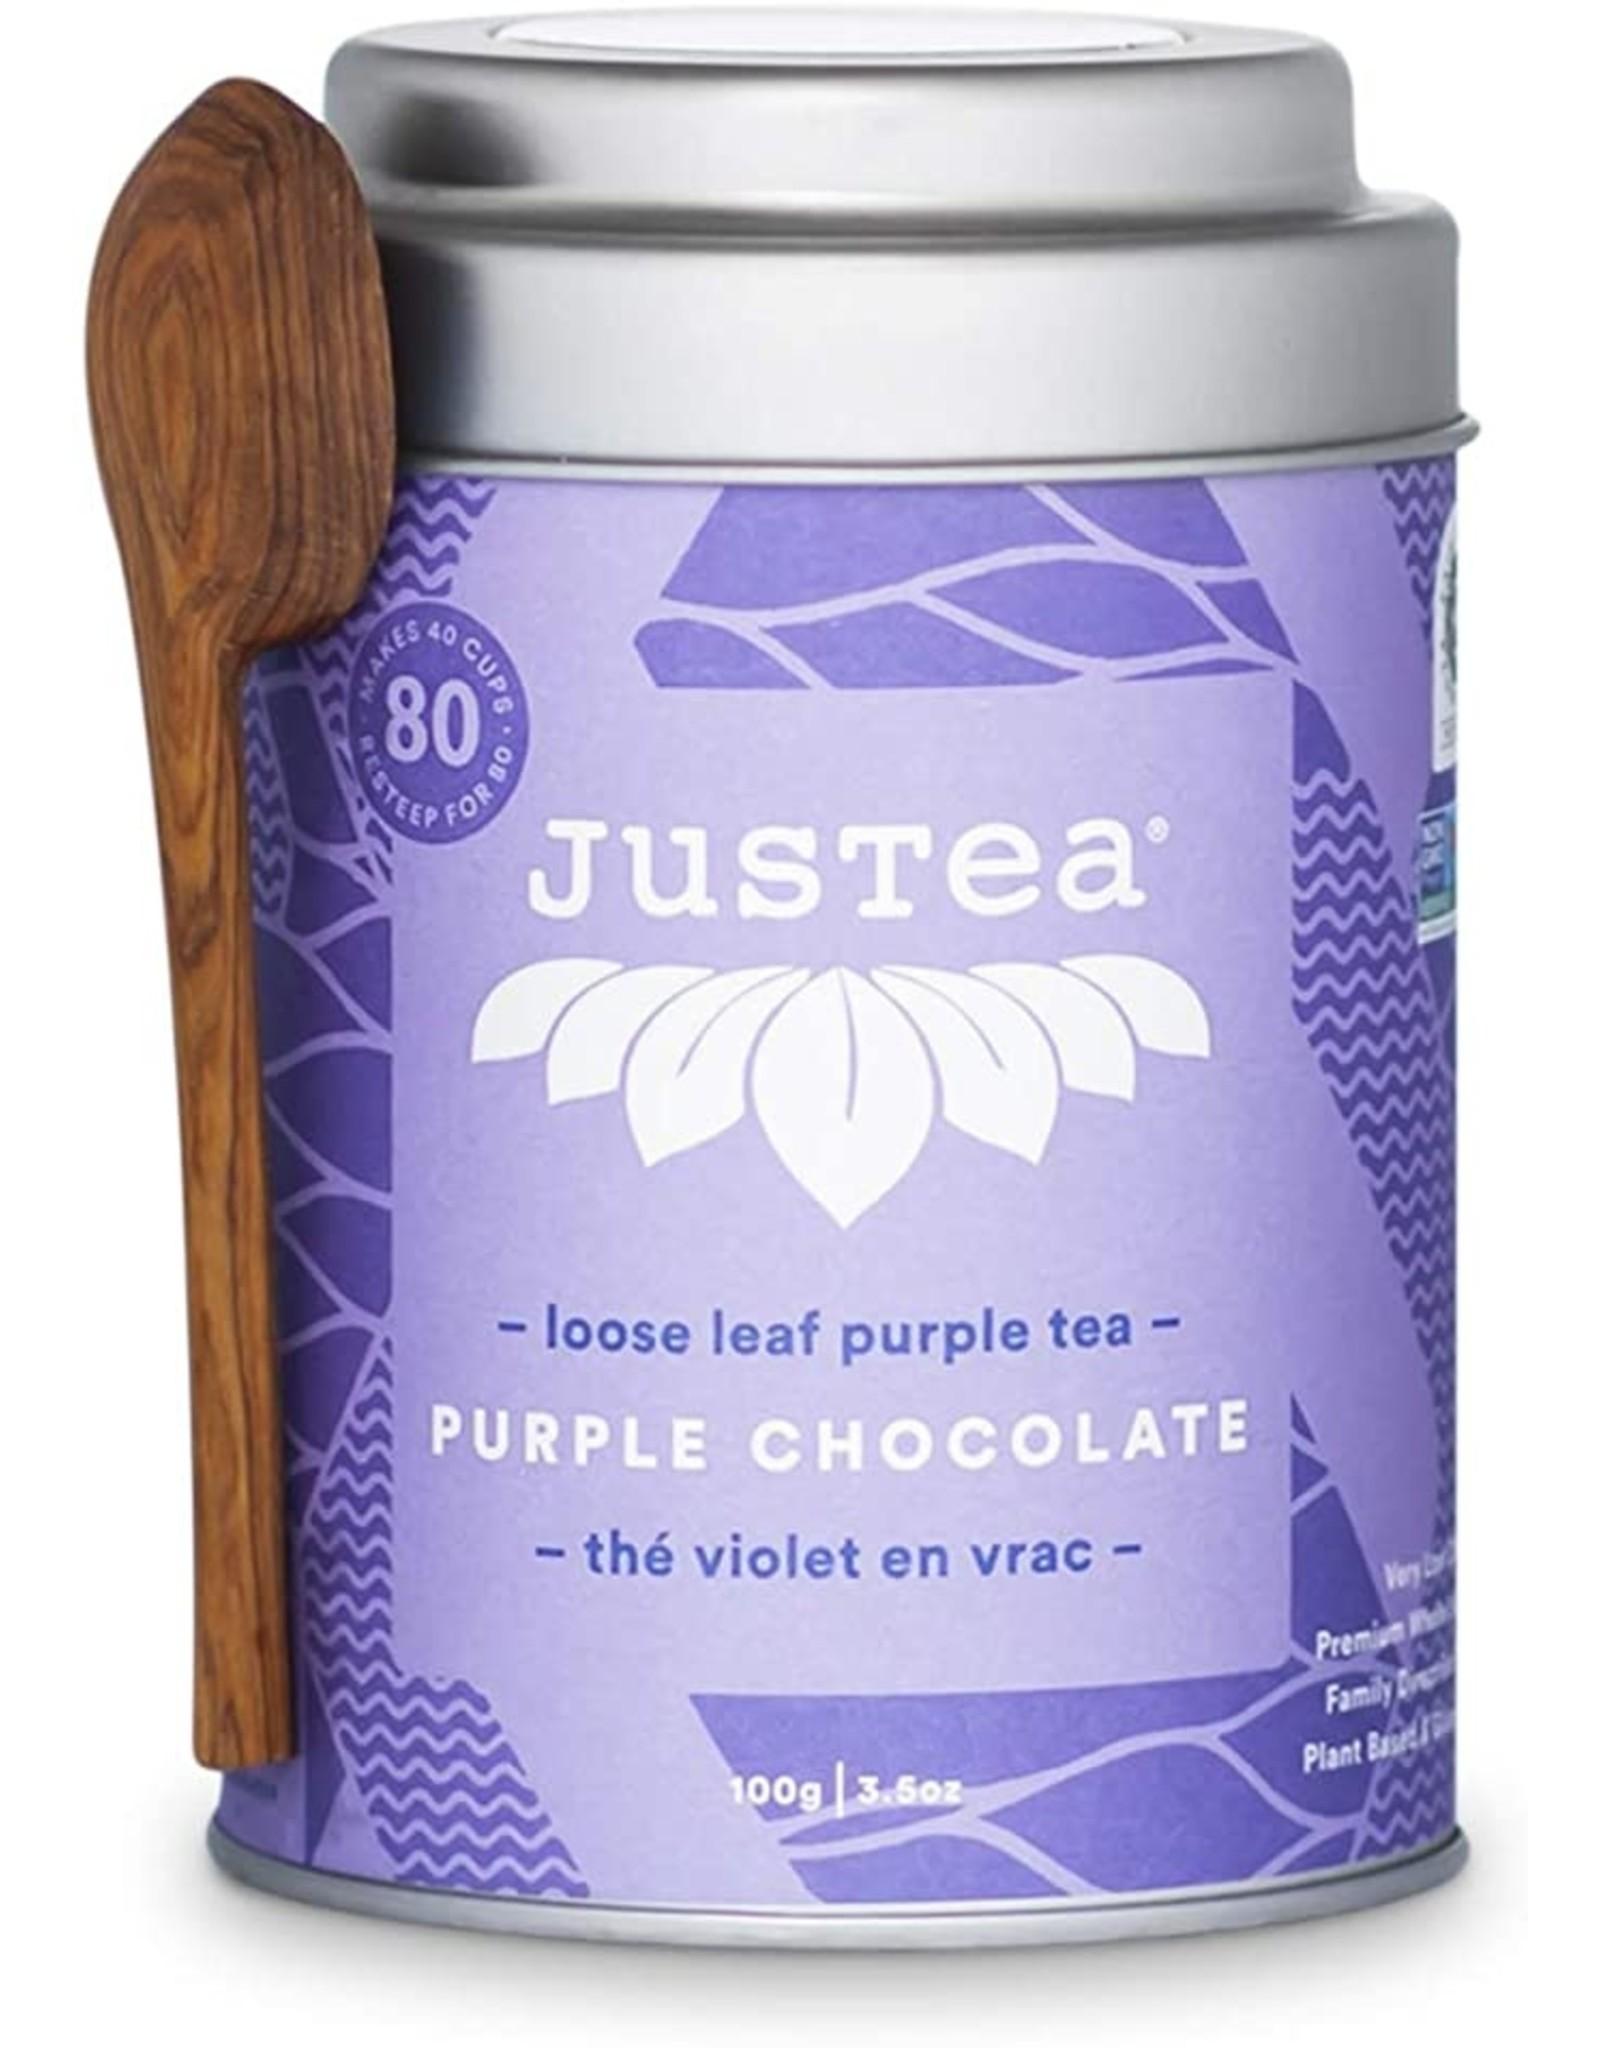 JusTea JusTea - Purple Chocolate